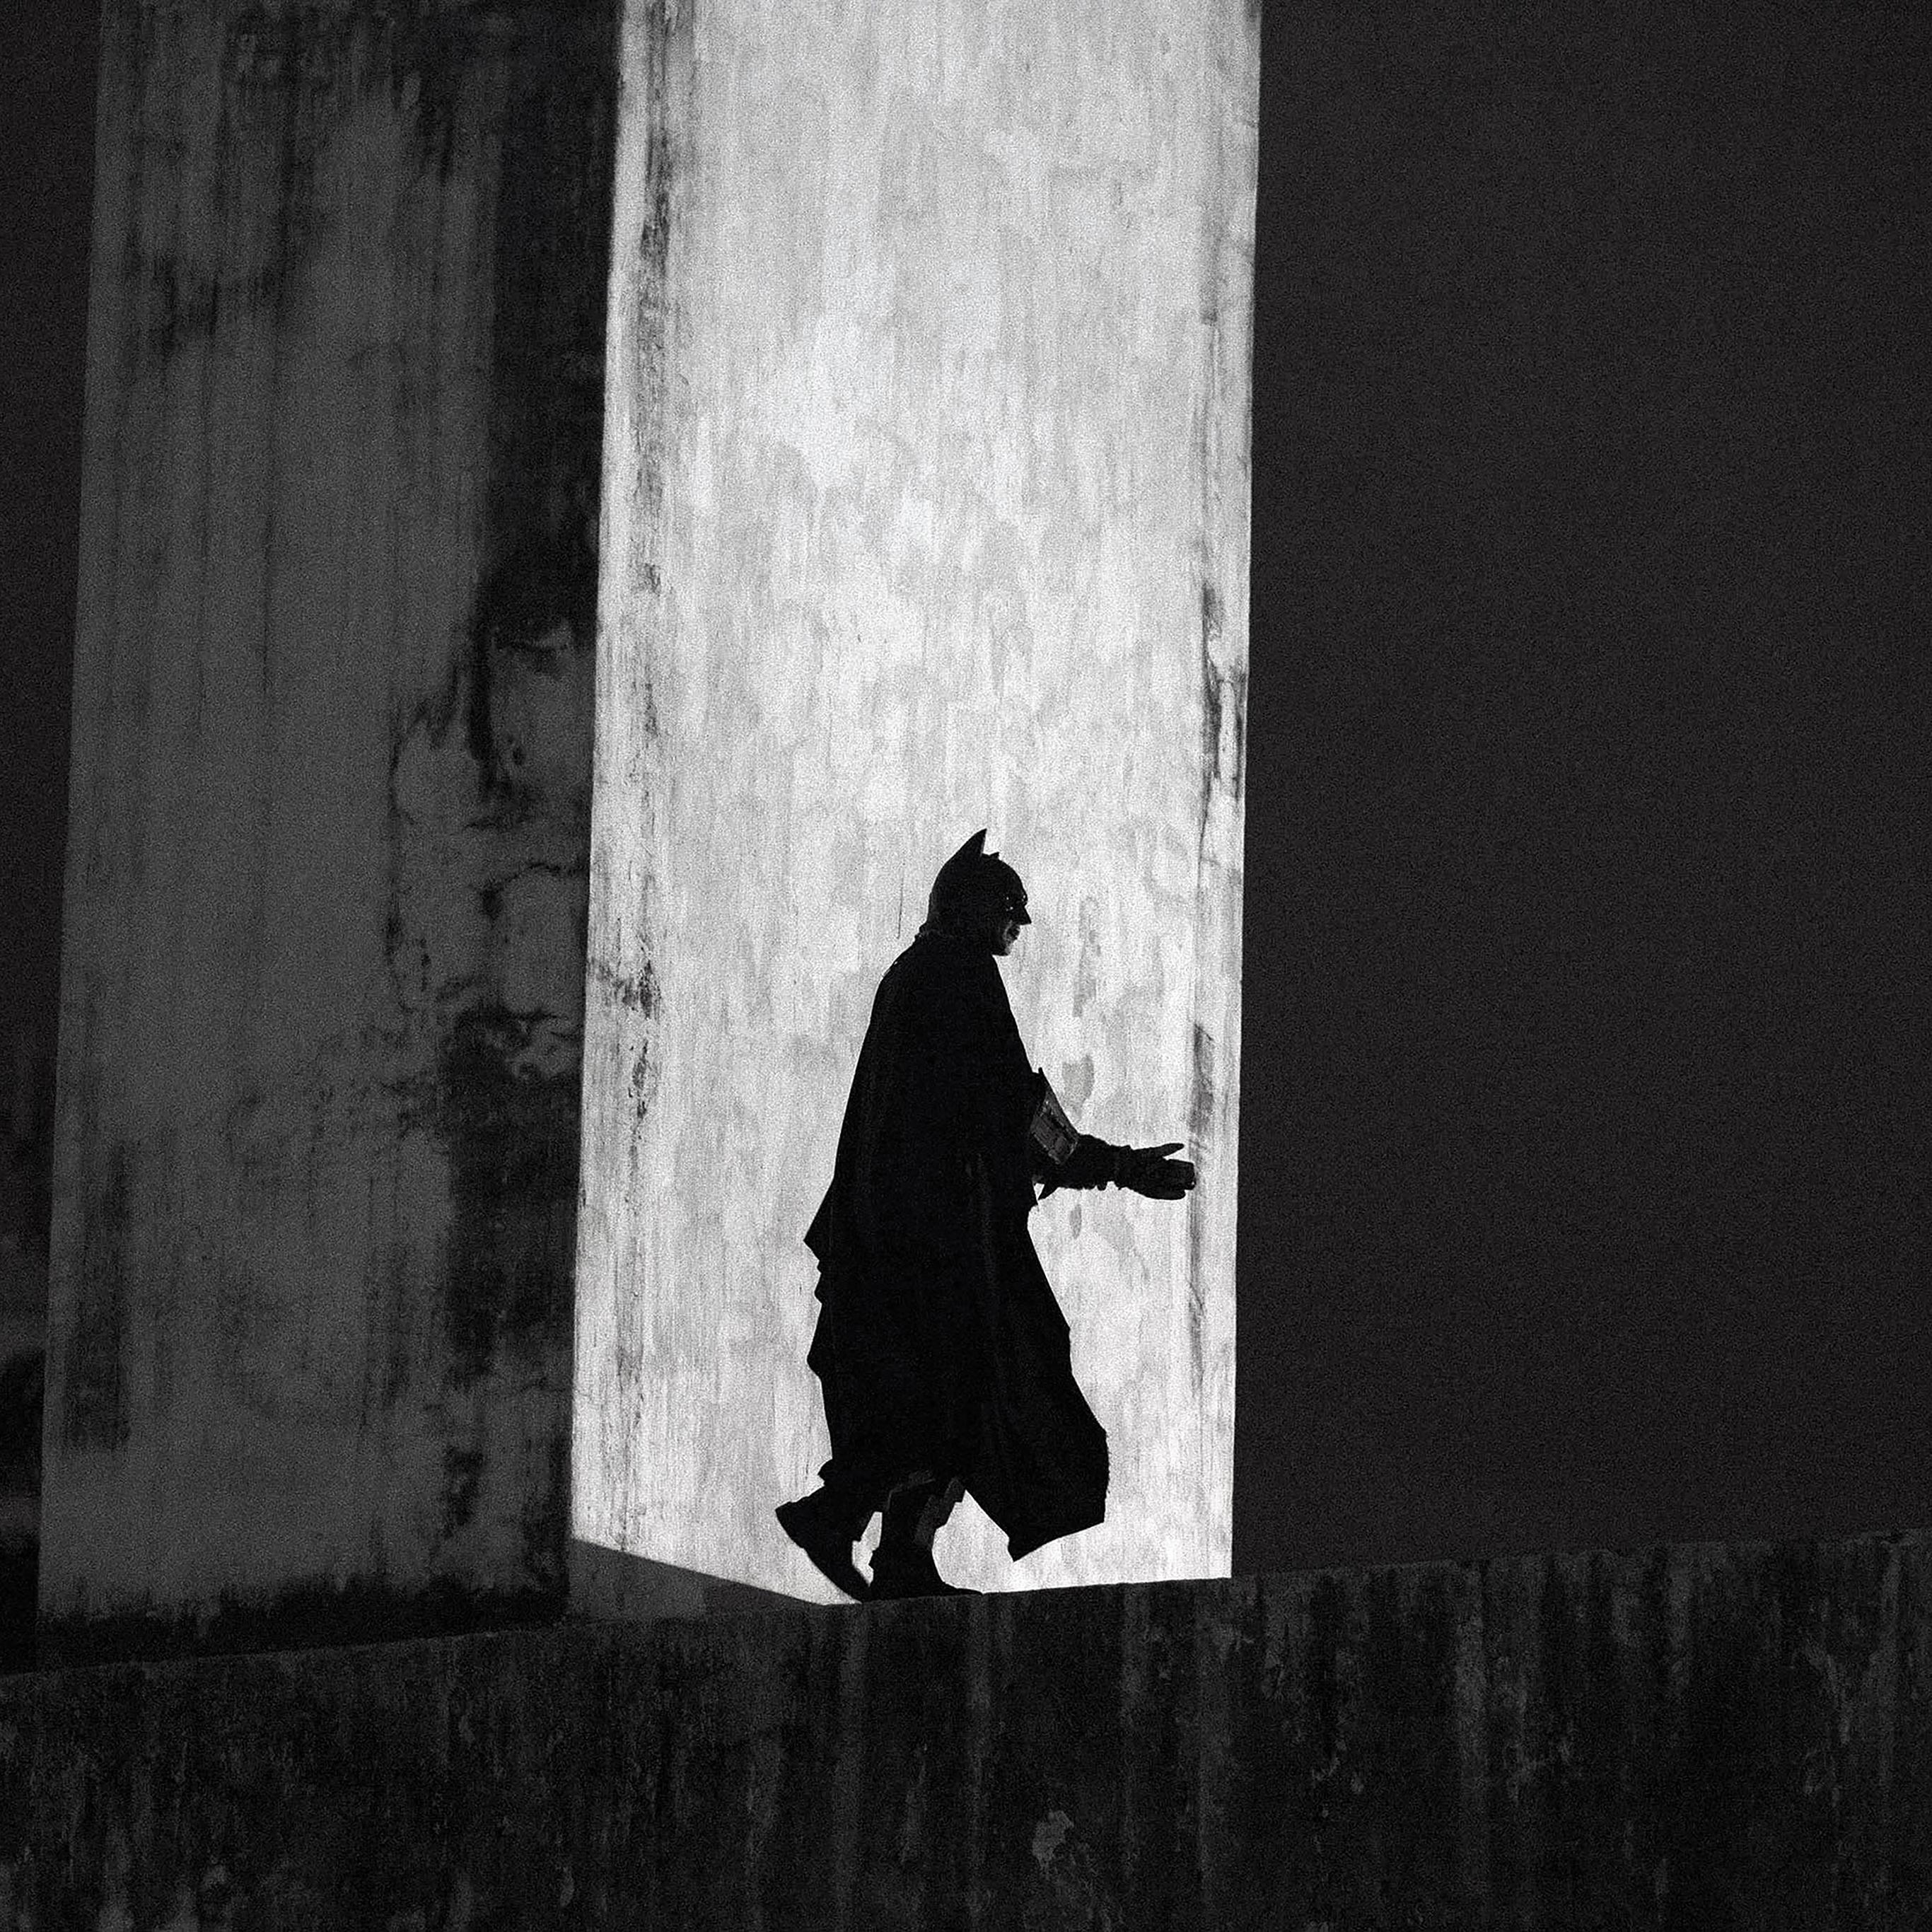 Kinzoku Bat Hd Wallpaper: Aa48-batman-street-art-dark-hero